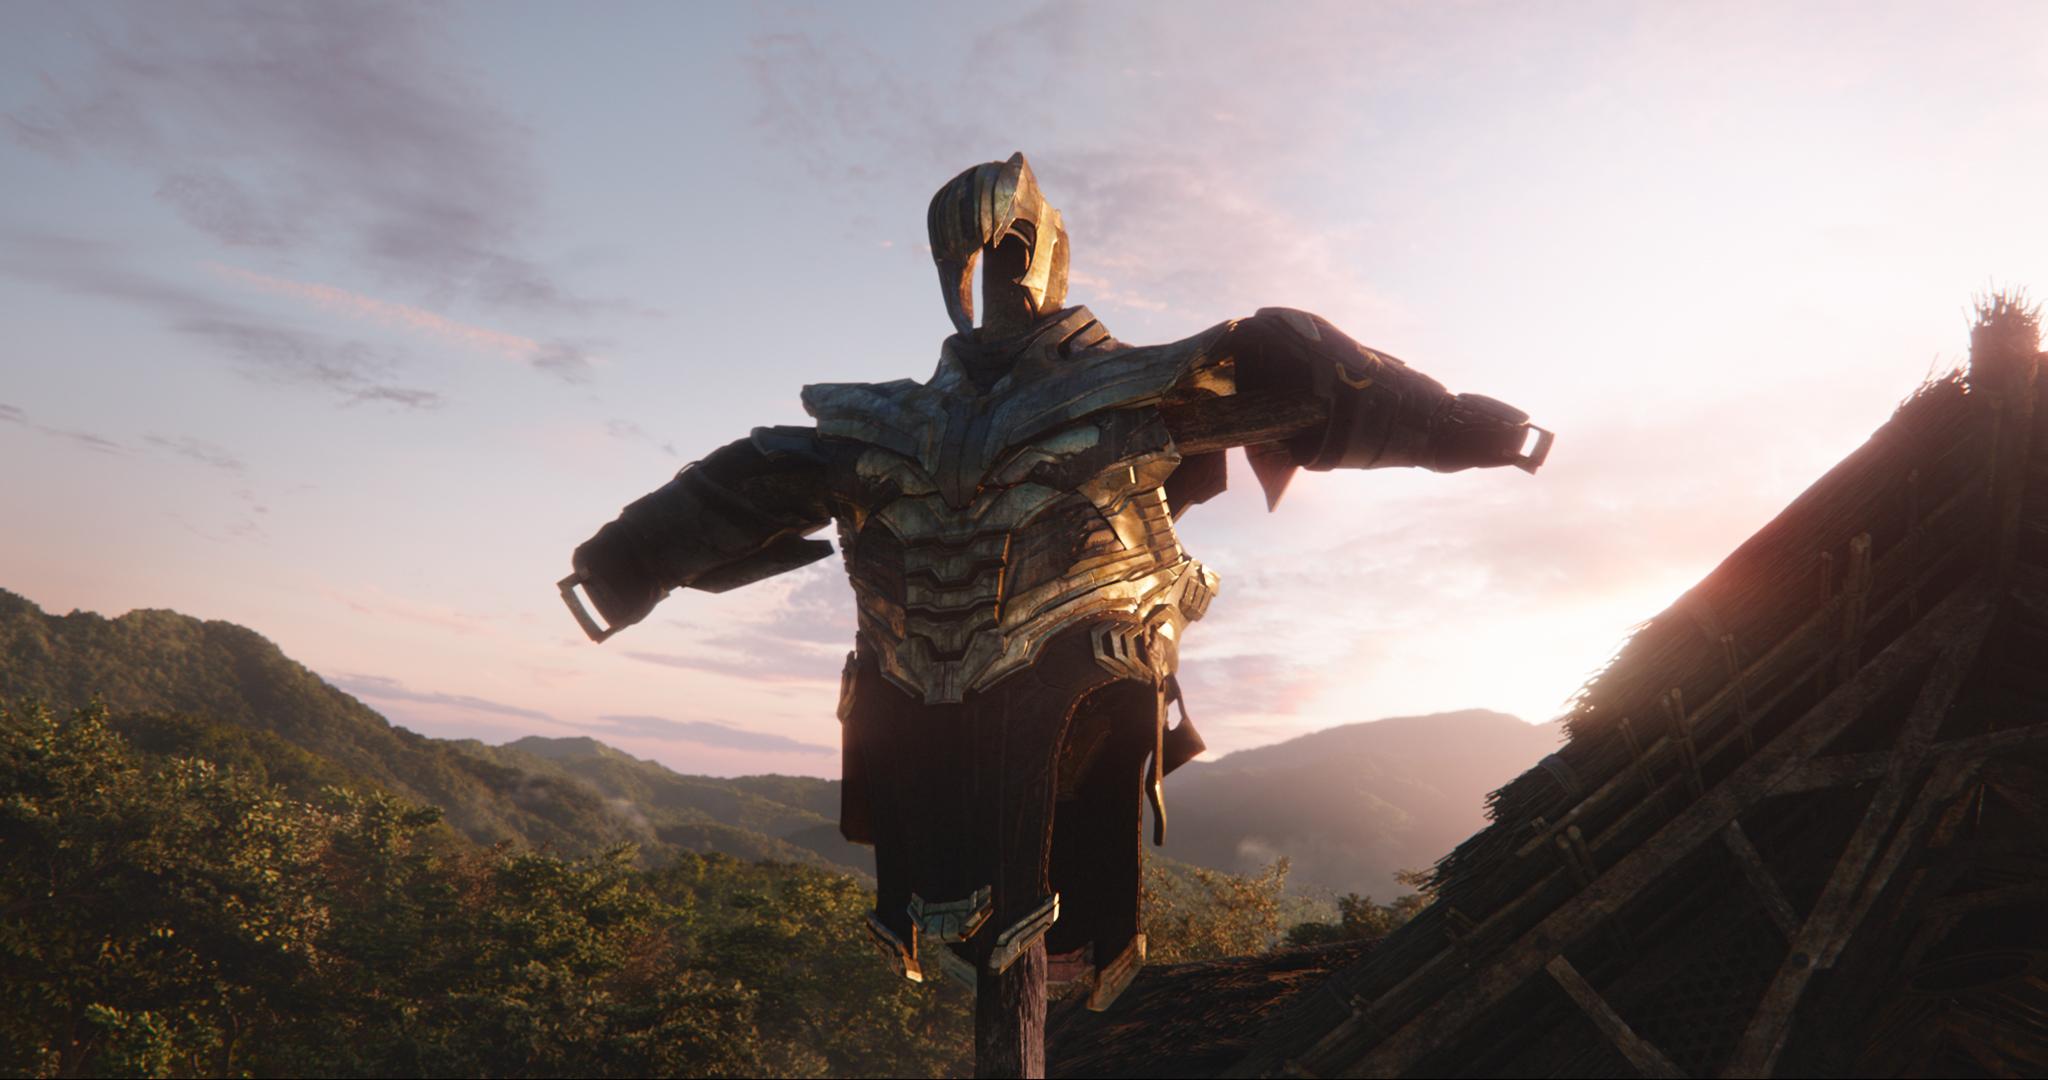 thanos-armor-endgame-trailer.png